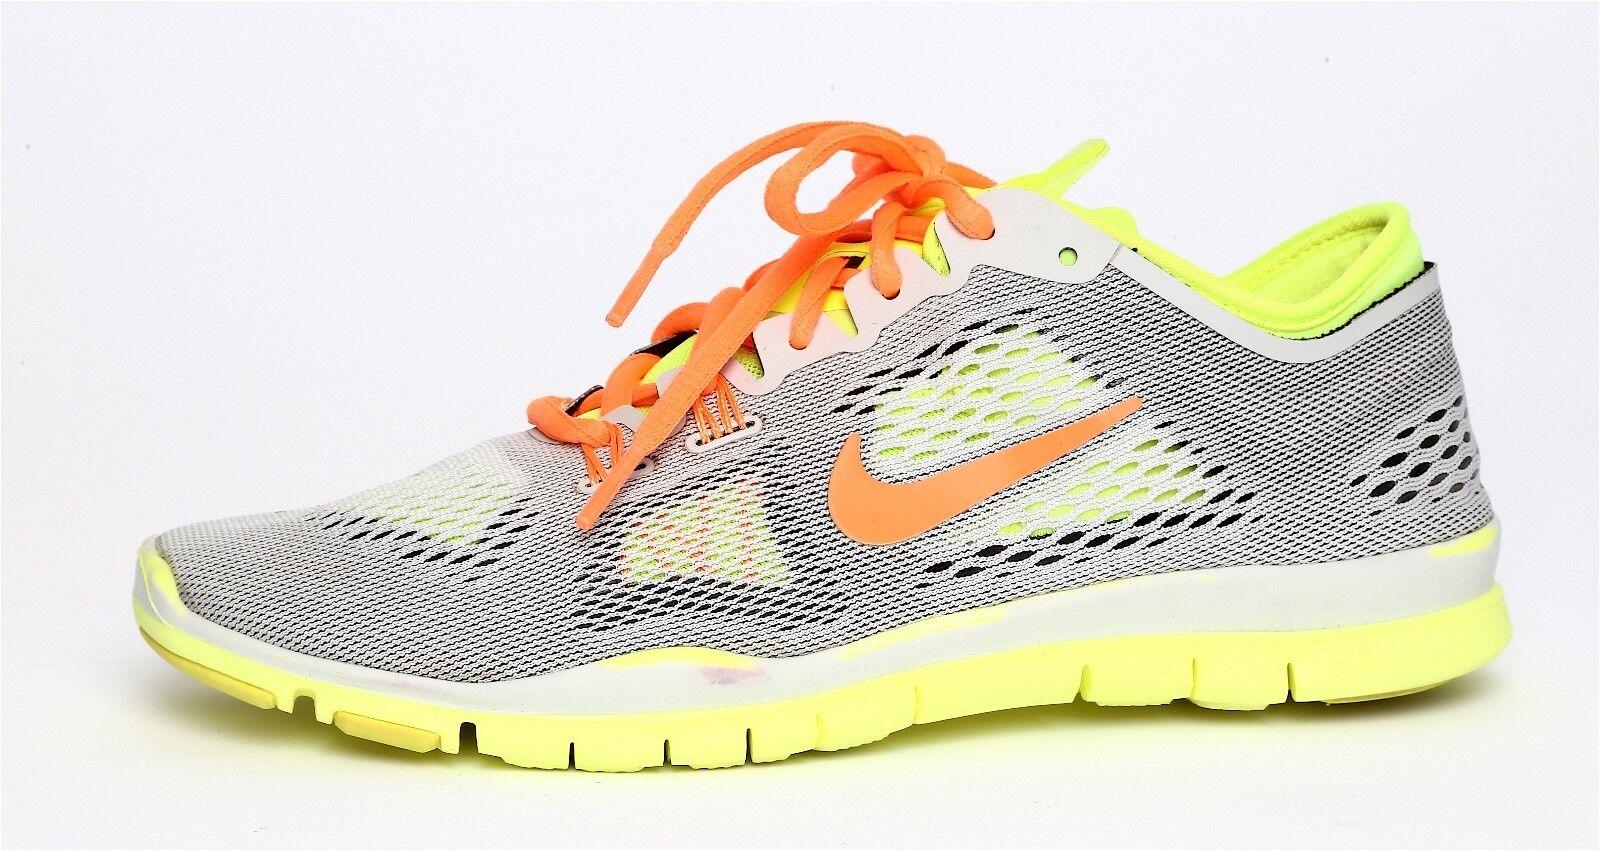 Nike Free 5.0 Women's Grey Lace Up Sneaker Sz 7.5 1024 Seasonal price cuts, discount benefits